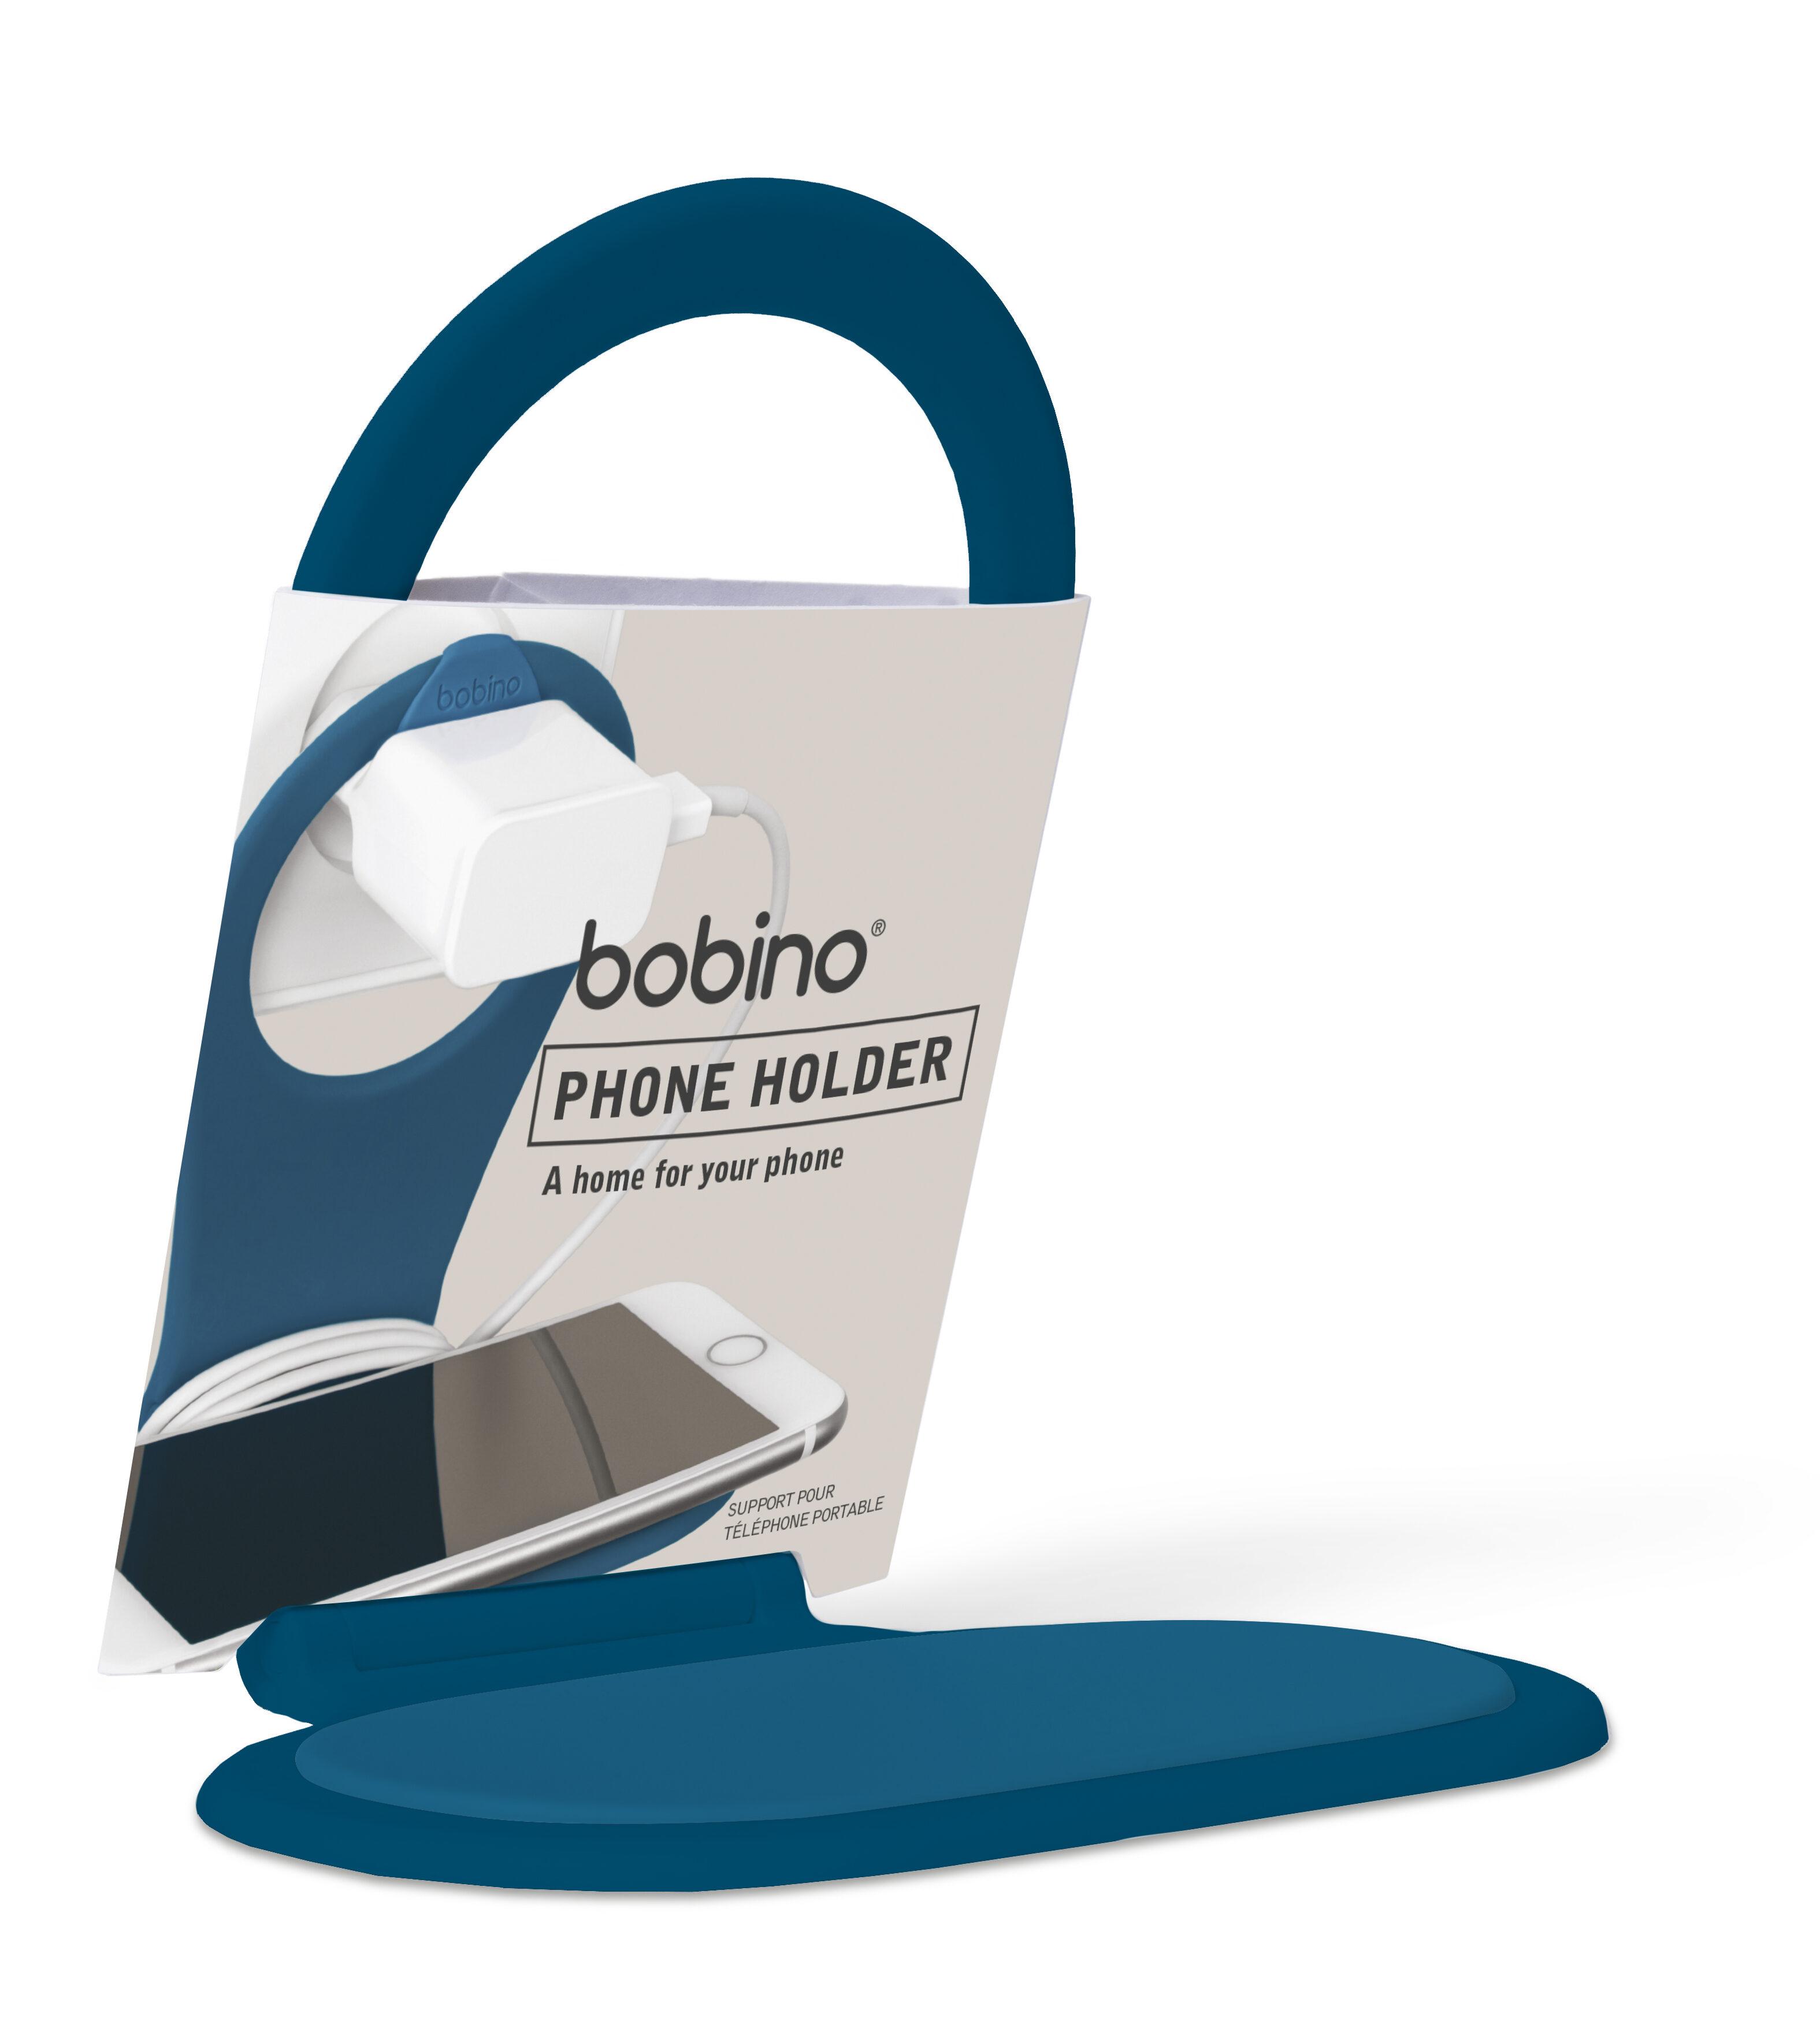 PhoneHolder_packaging_example_blue